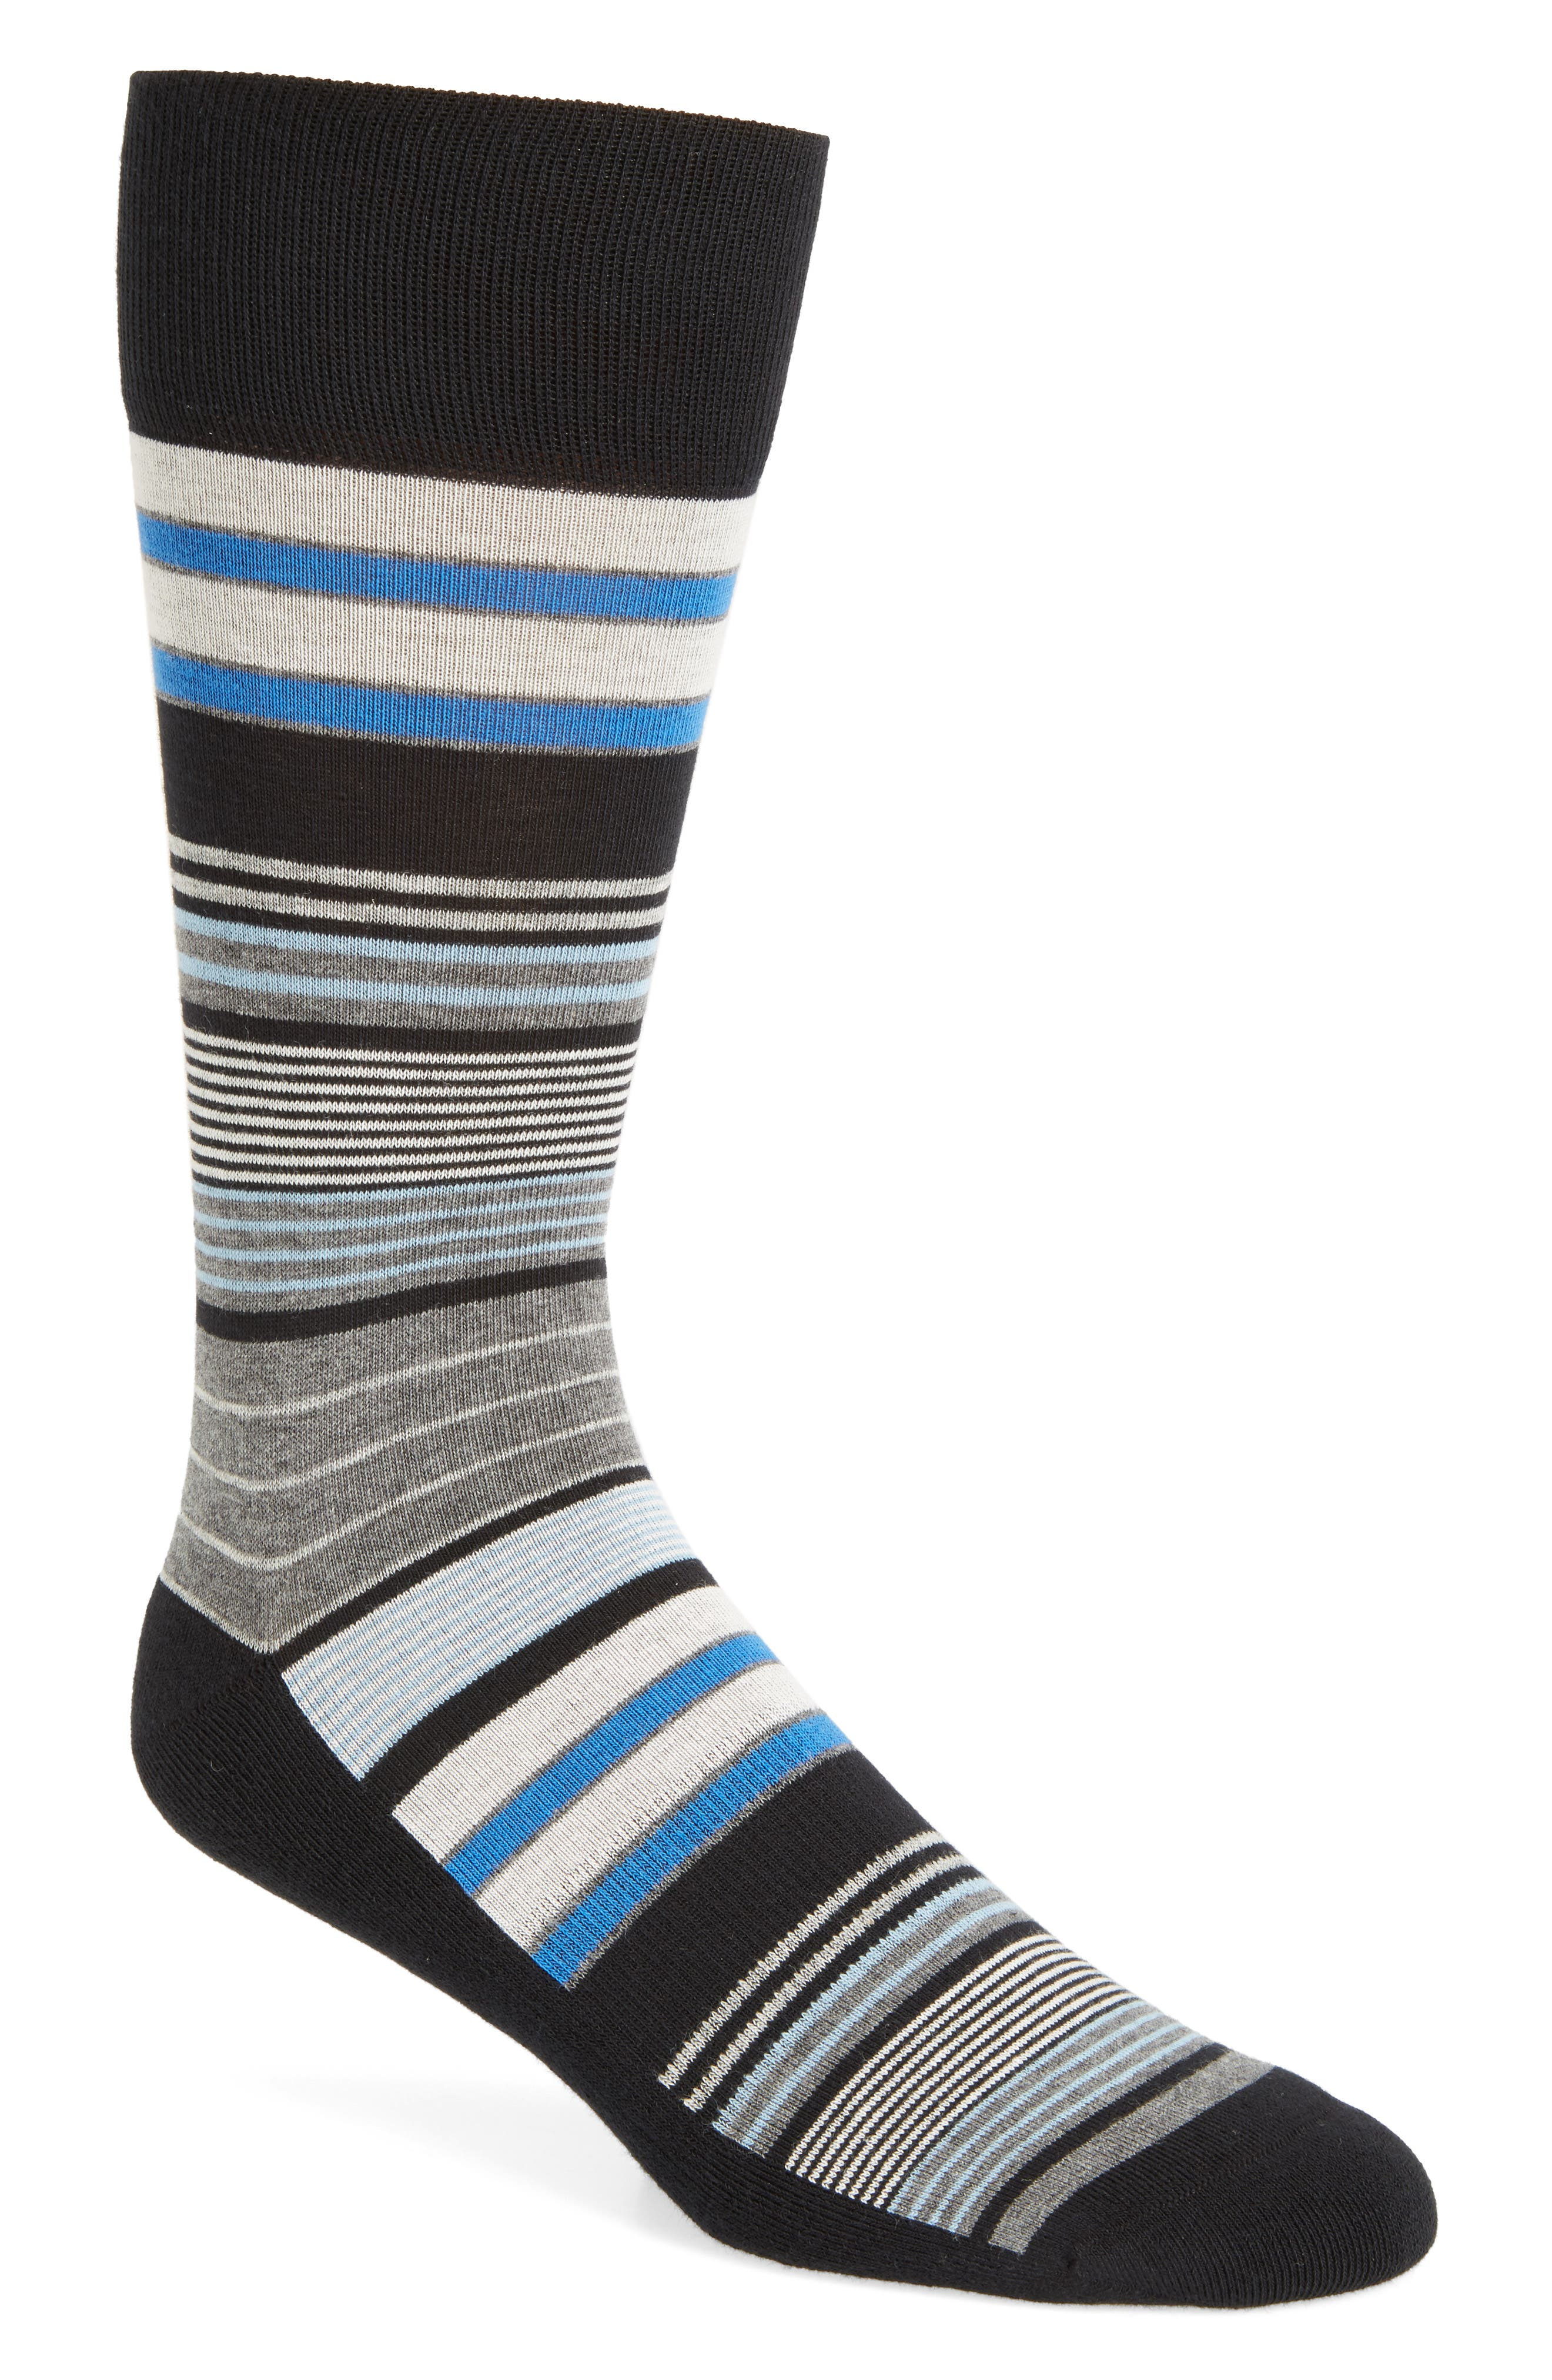 Random Stripe Socks,                             Main thumbnail 1, color,                             001